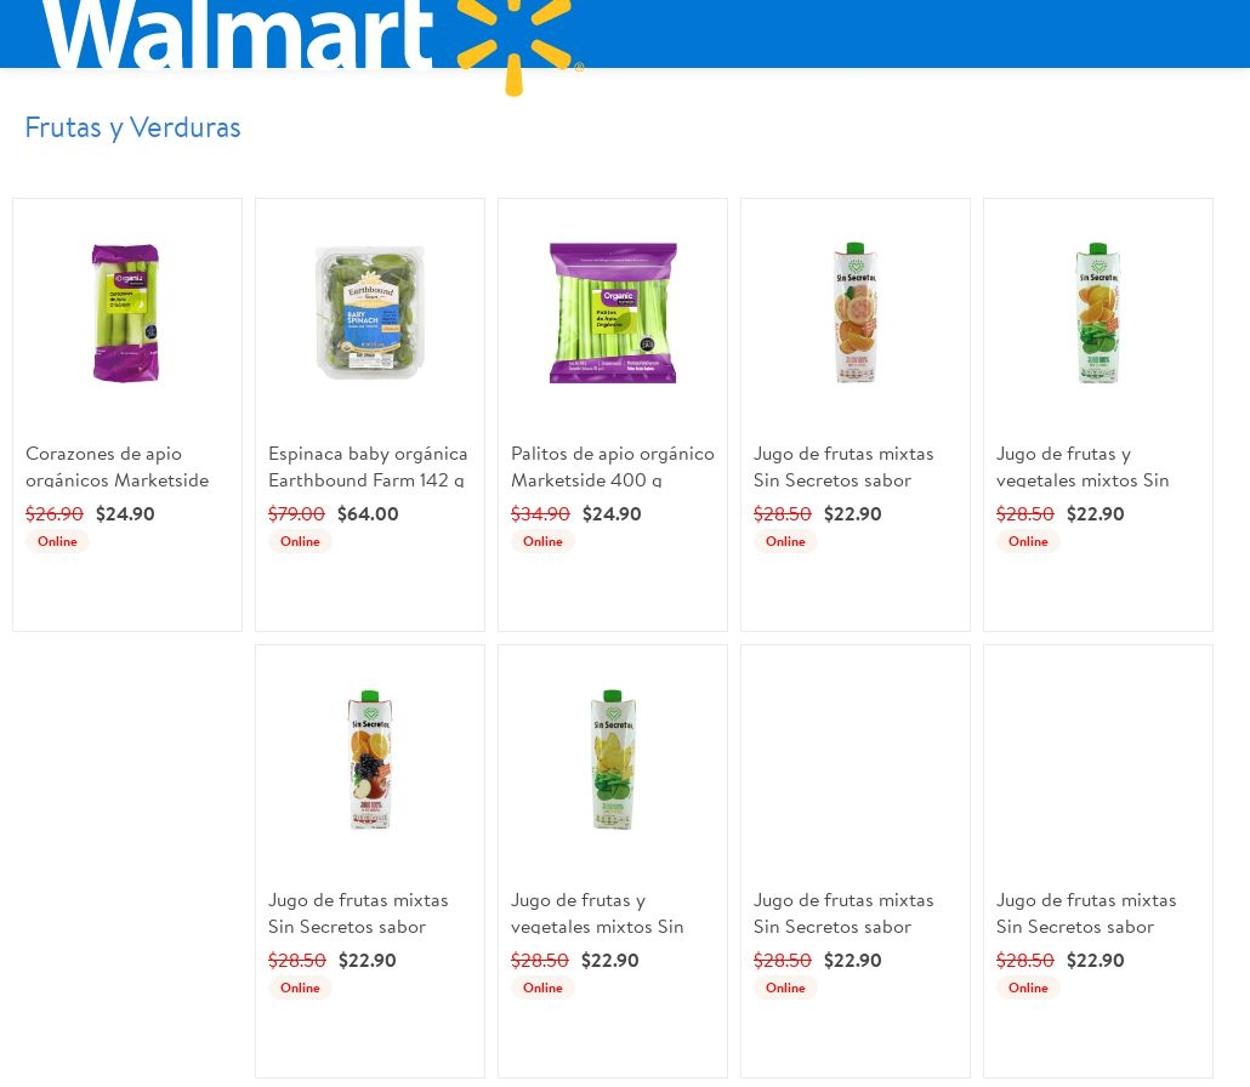 Walmart Folleto - 22.04-28.04.2021